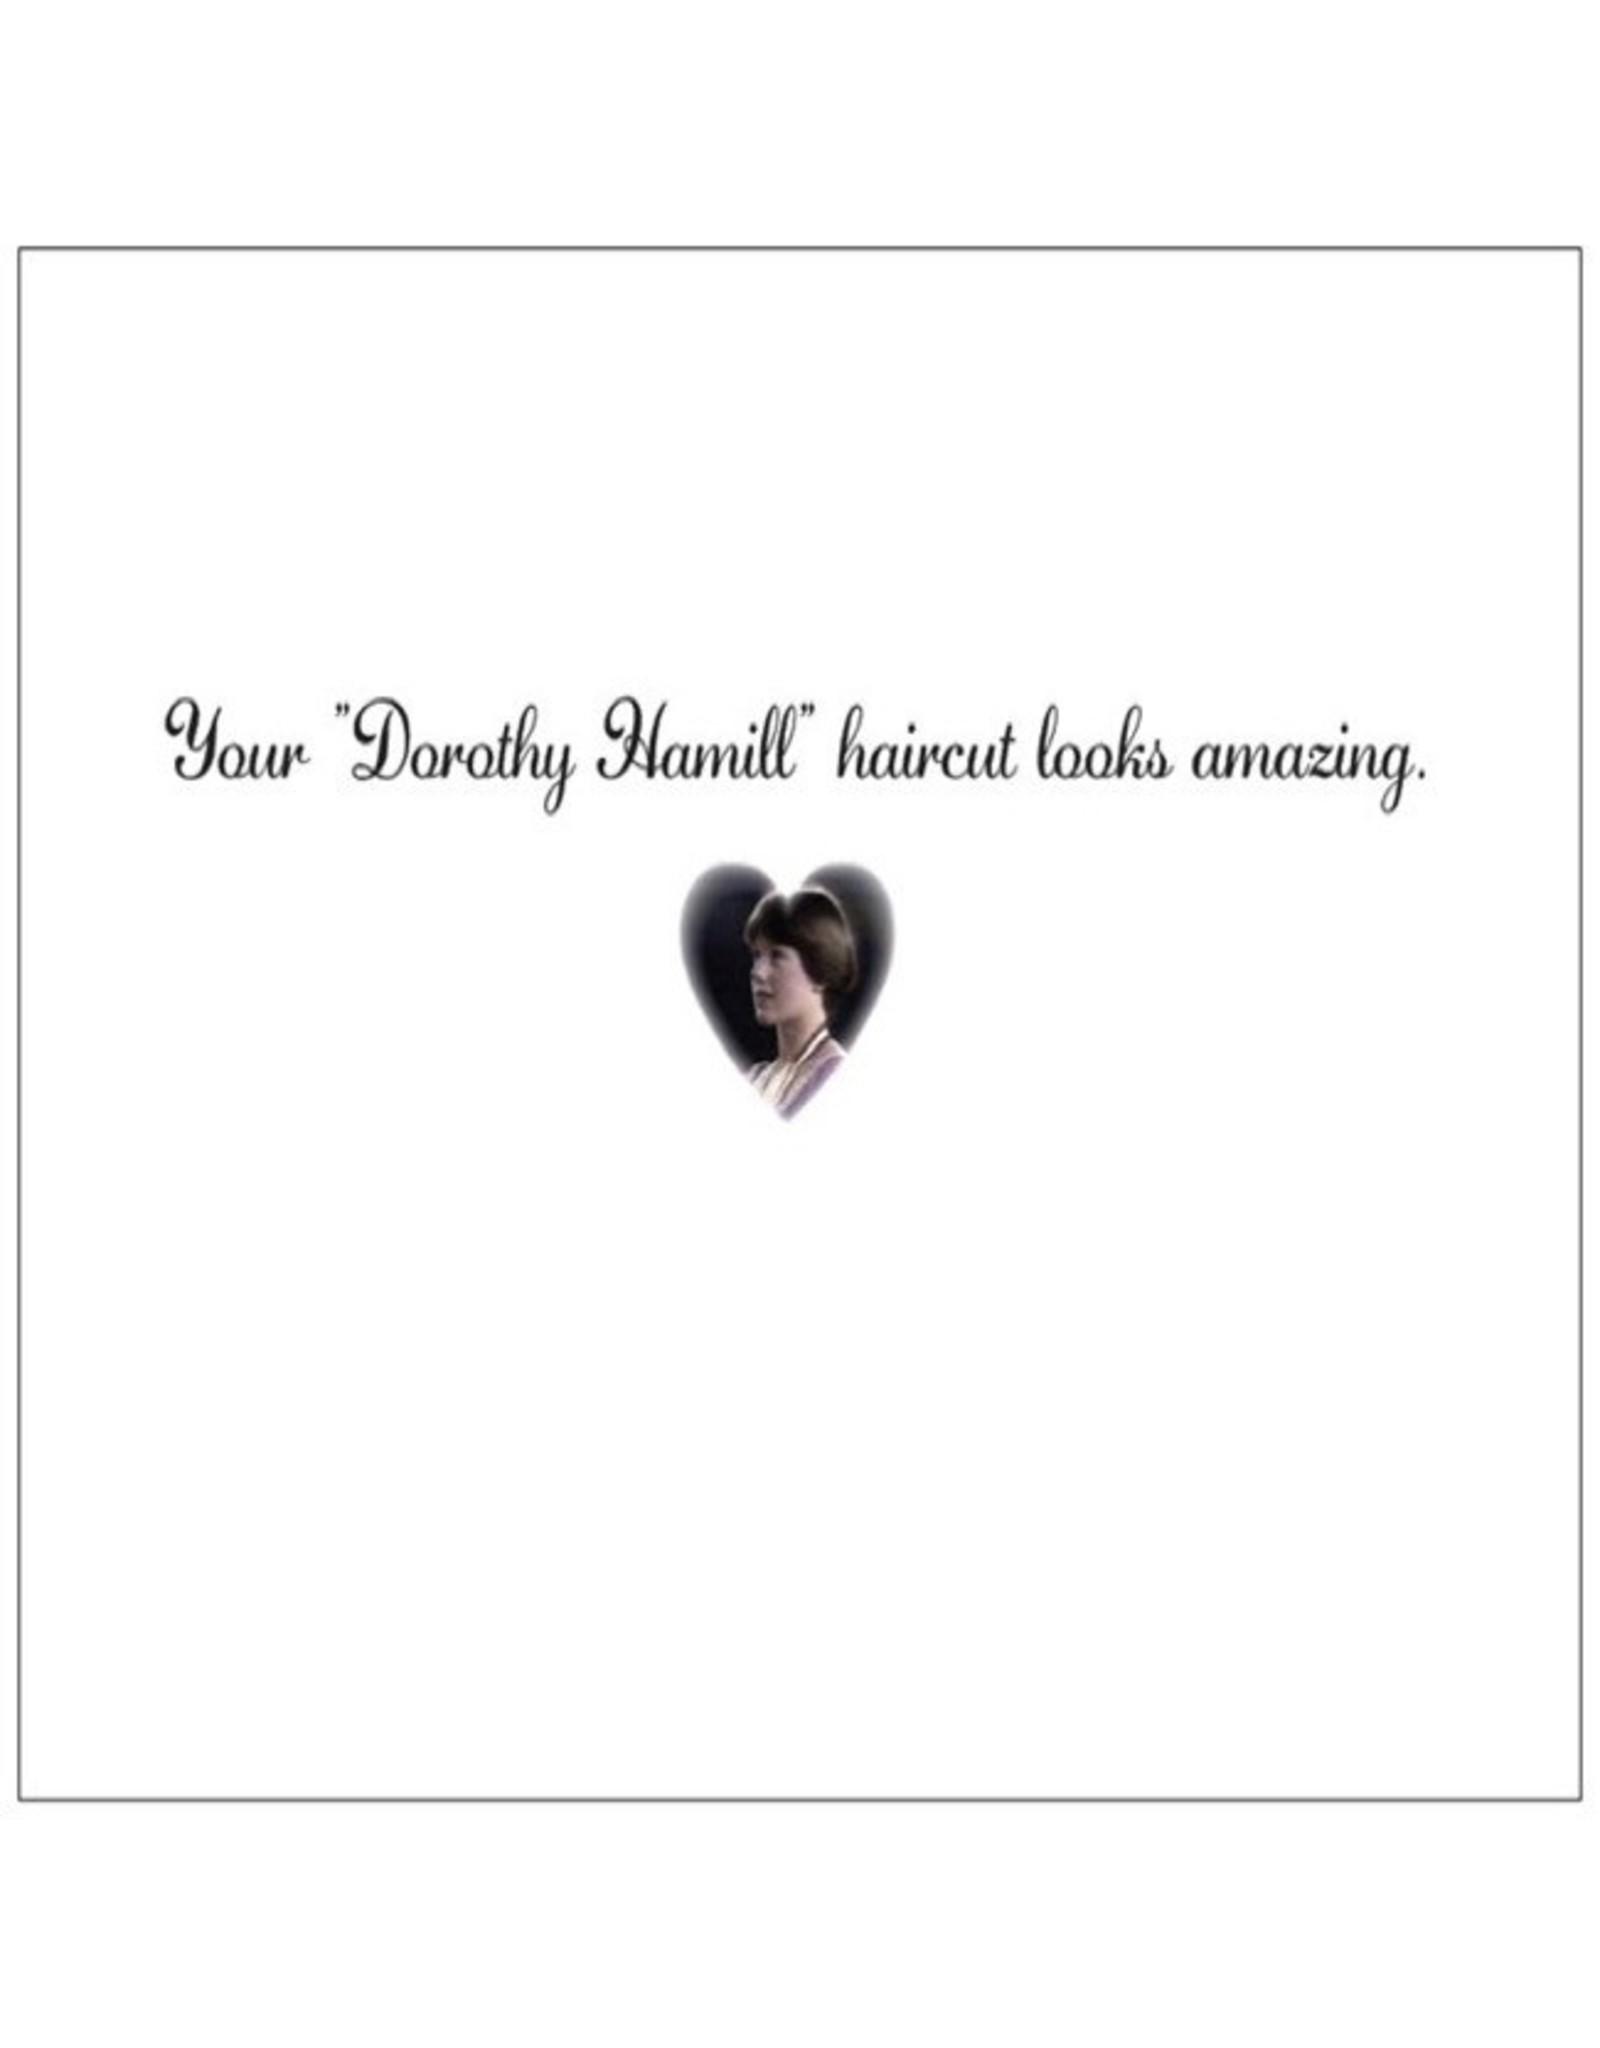 Card #063 - Dorothy Hamill Haircut